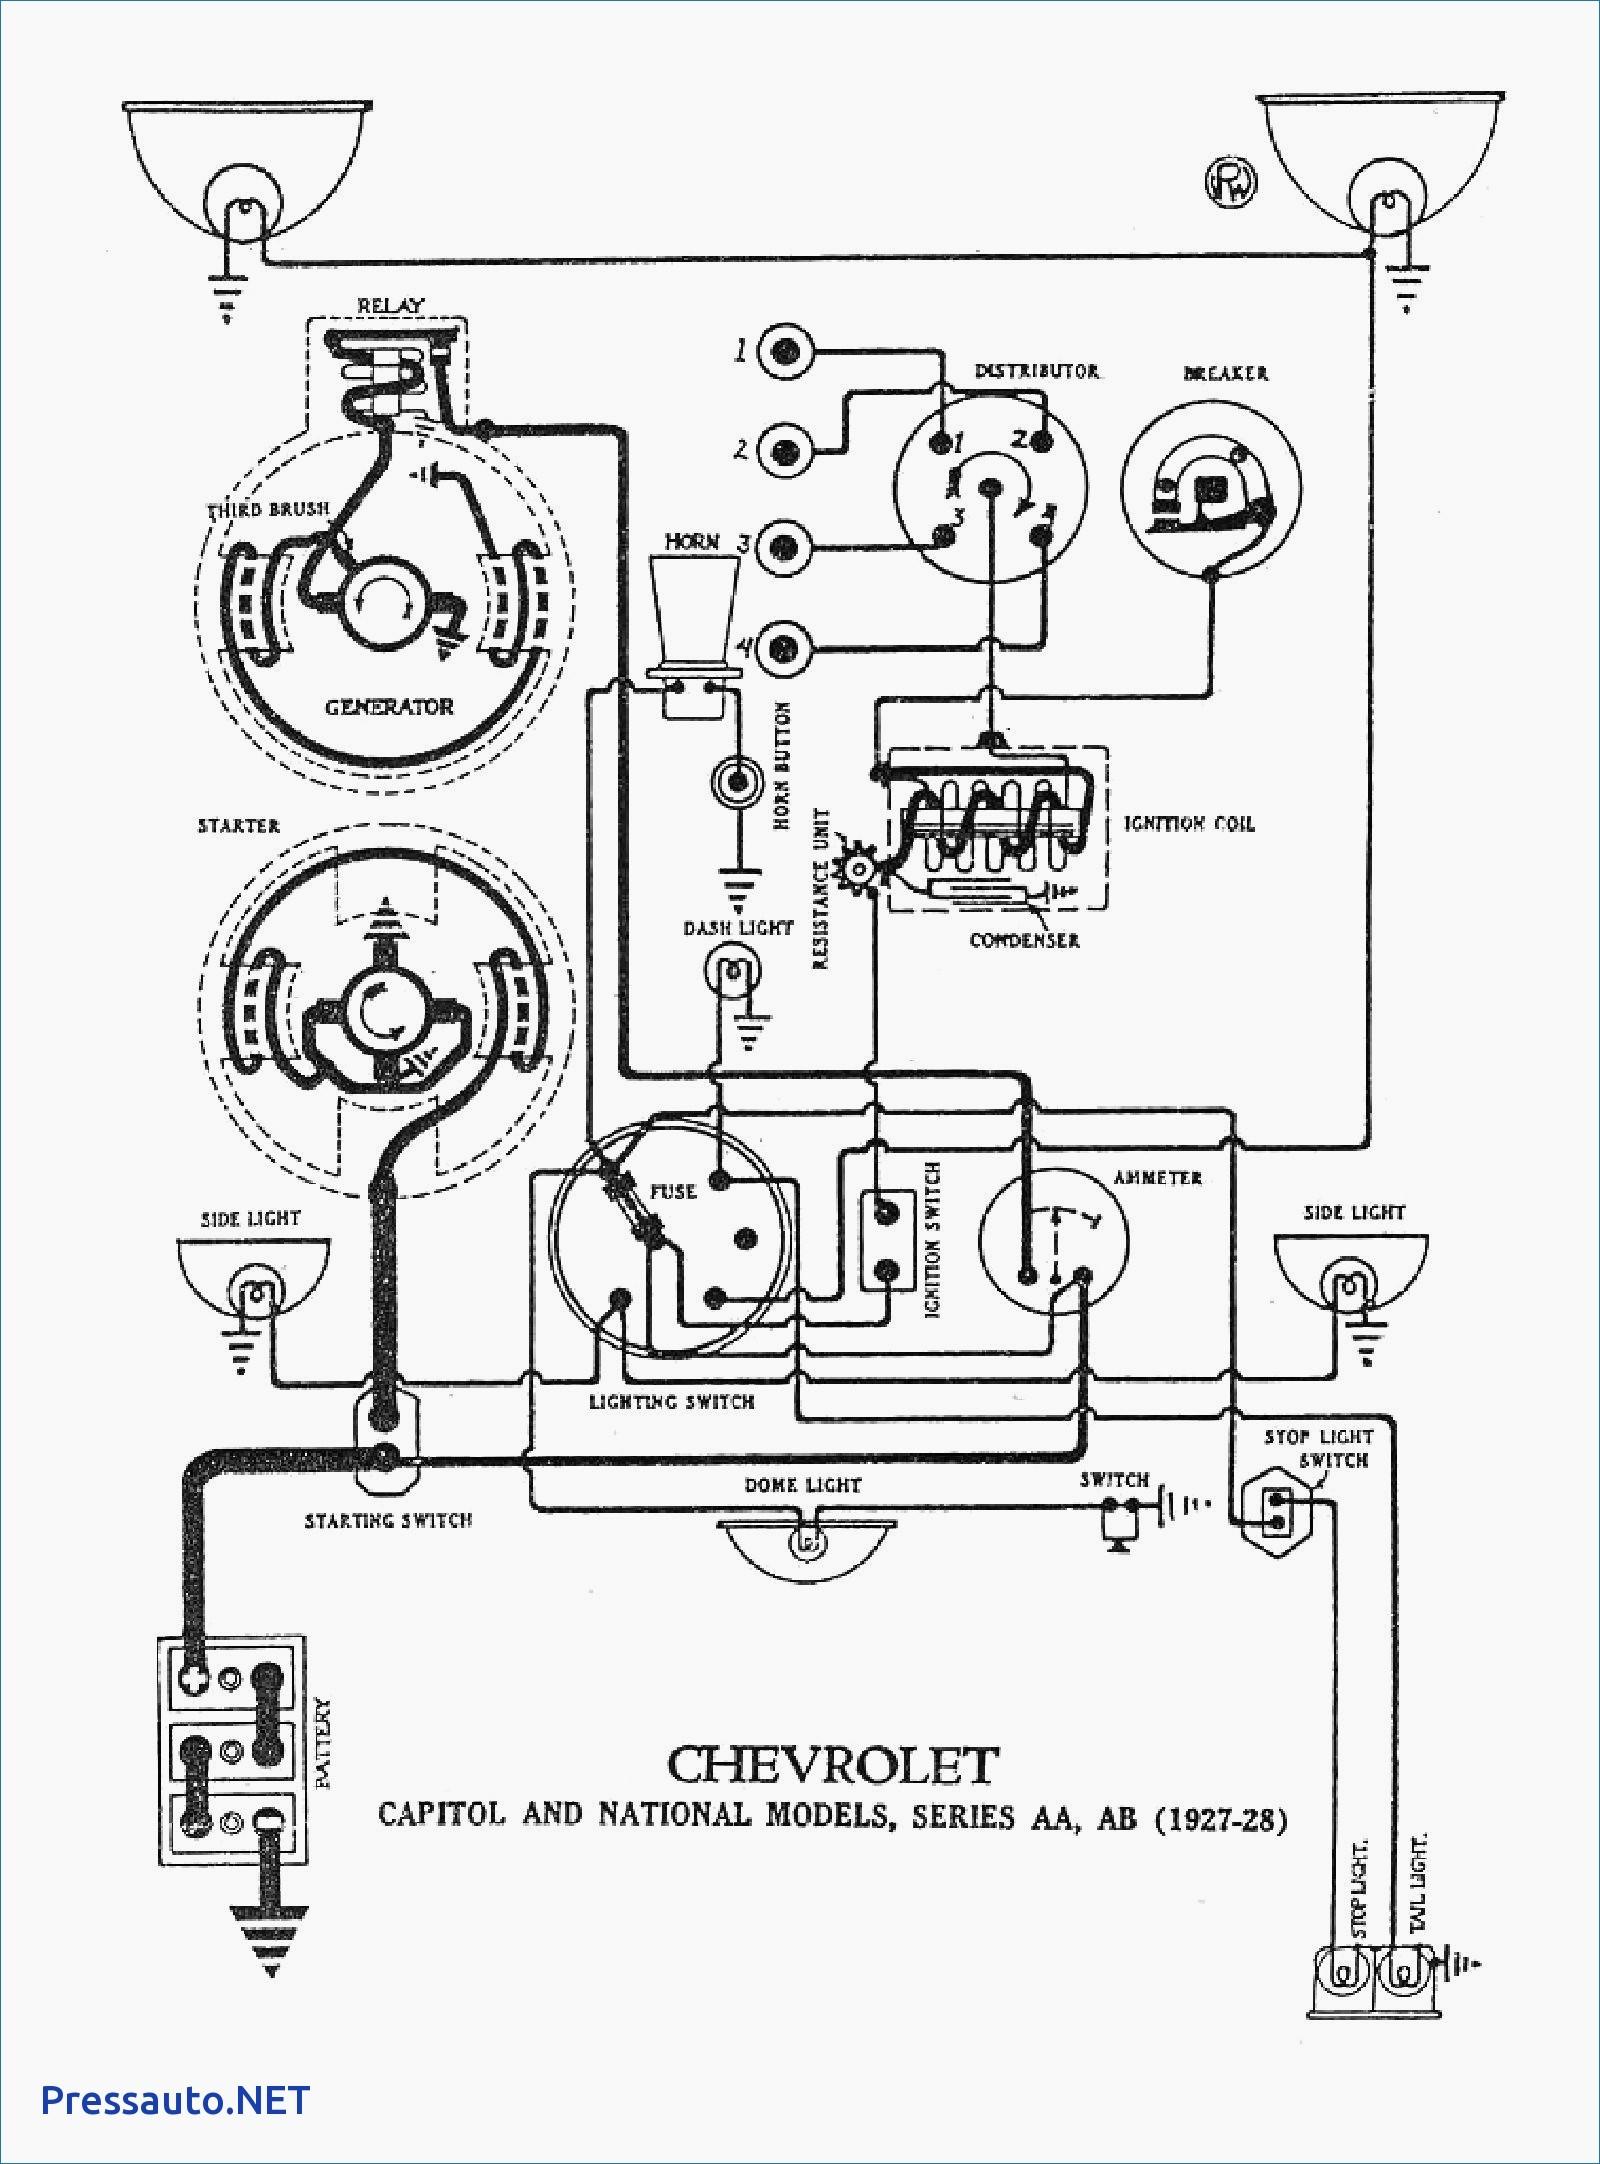 2004 dodge ram 1500 trailer wiring diagram download 2 1954 oldsmobile wiring diagram at wws5